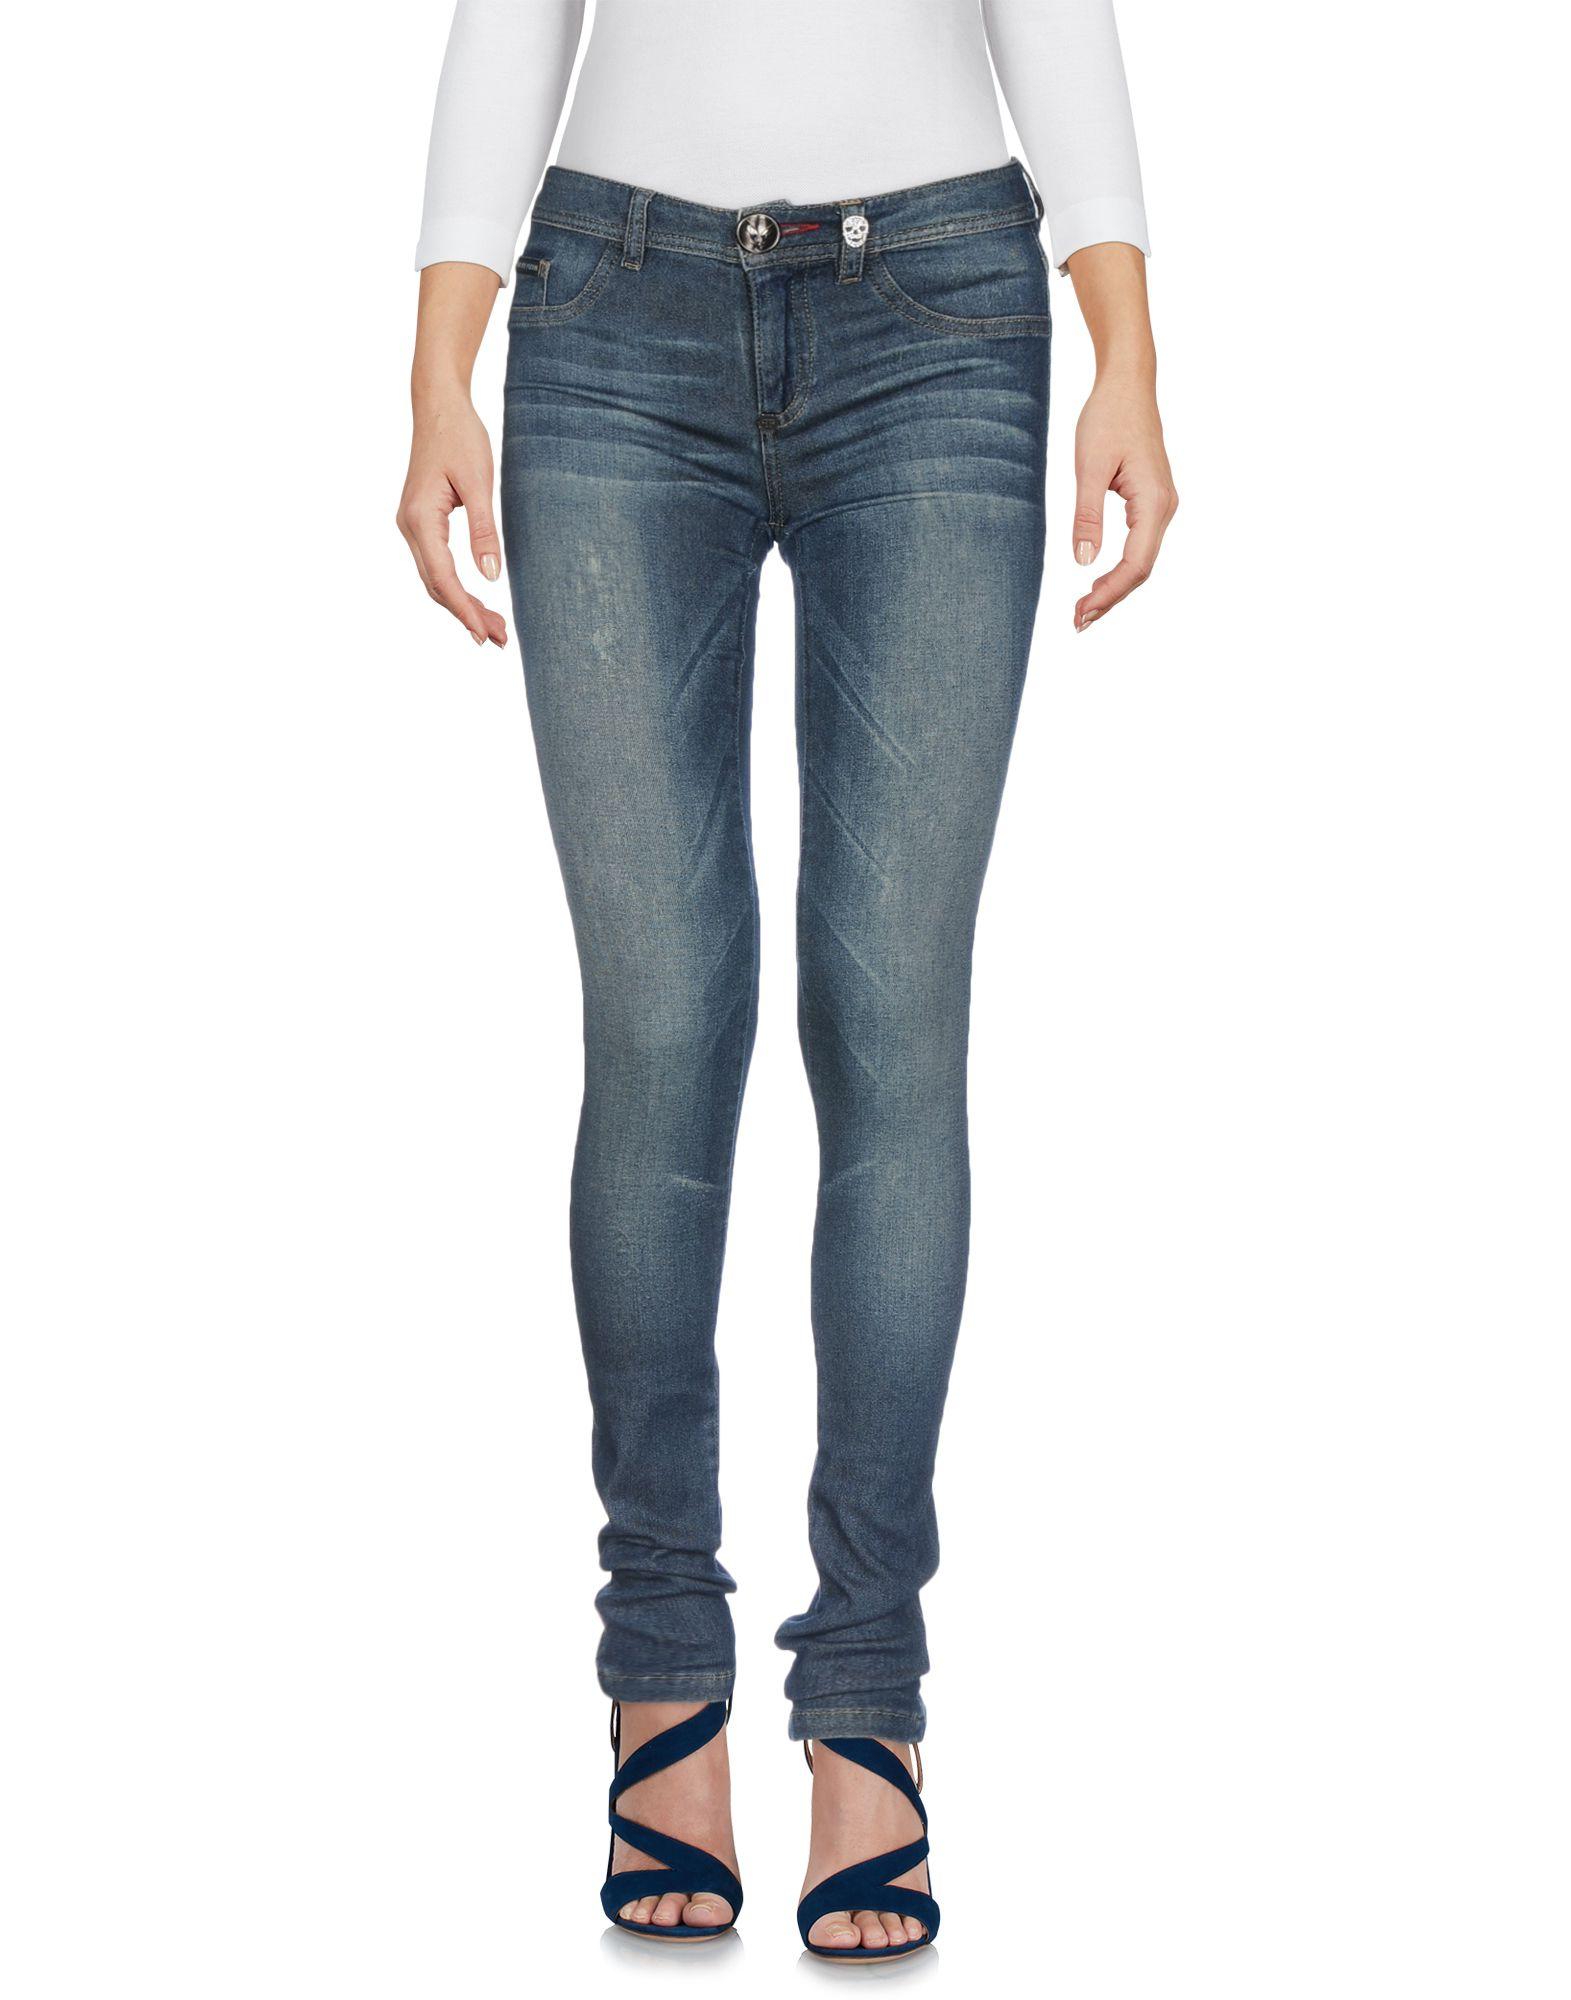 Pantaloni Jeans Philipp Plein Donna - Acquista online su kEmq7s5jZ